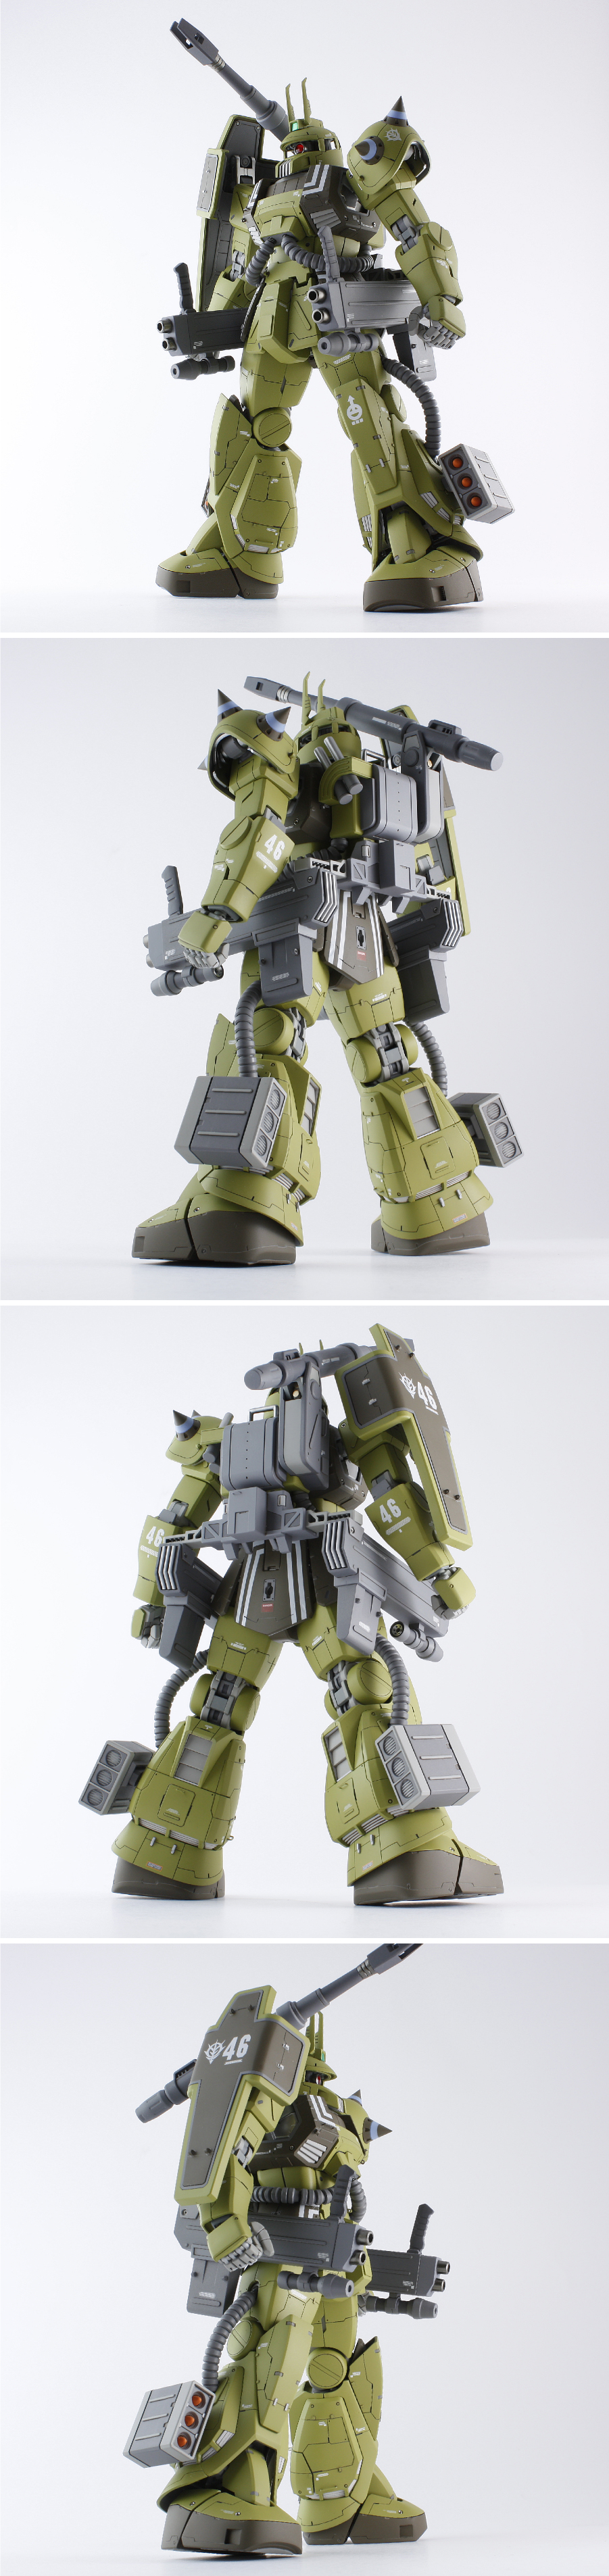 cannon_1.jpg